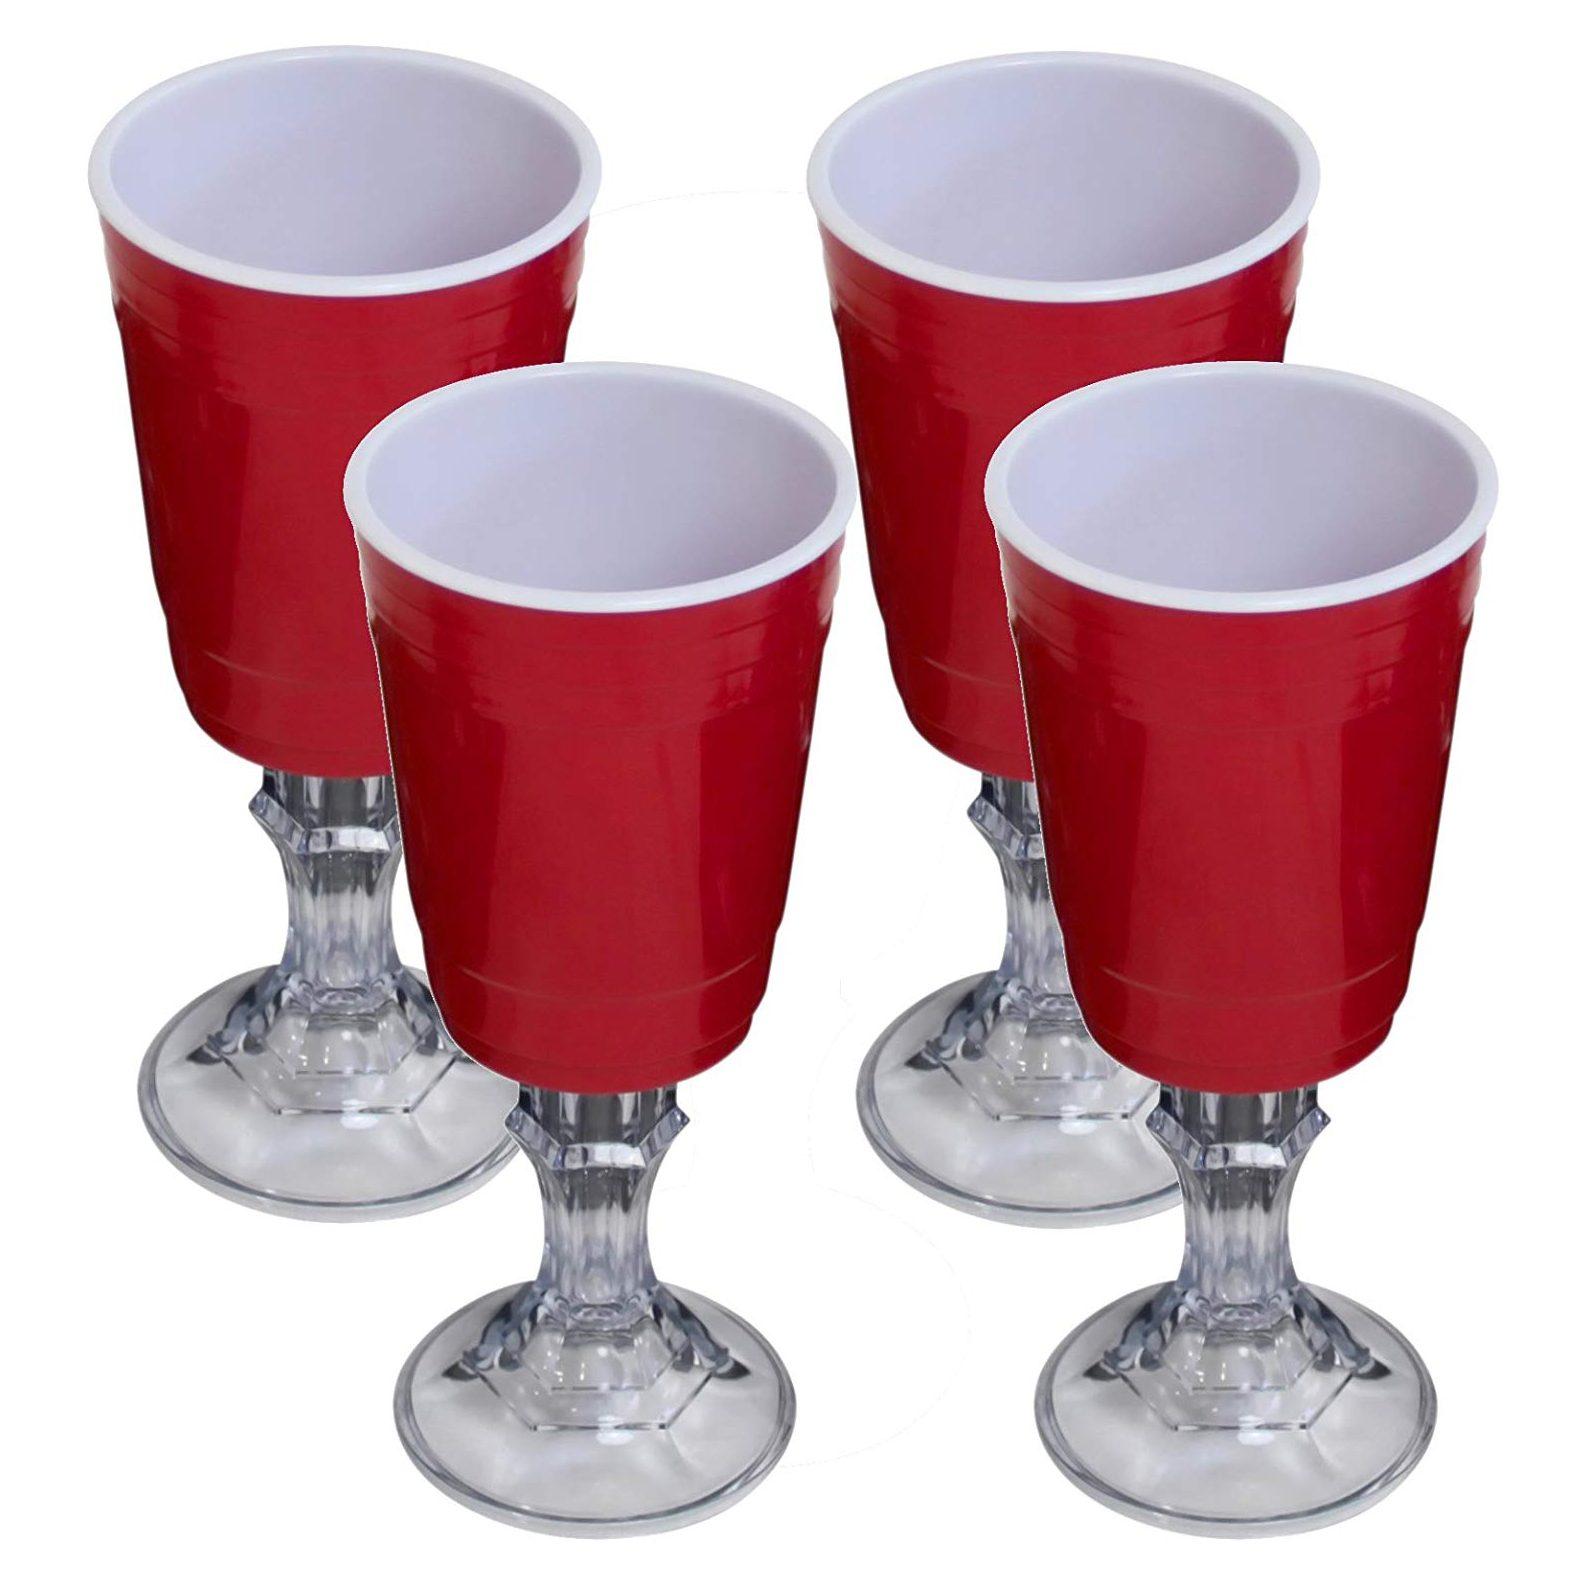 red solo wine glass